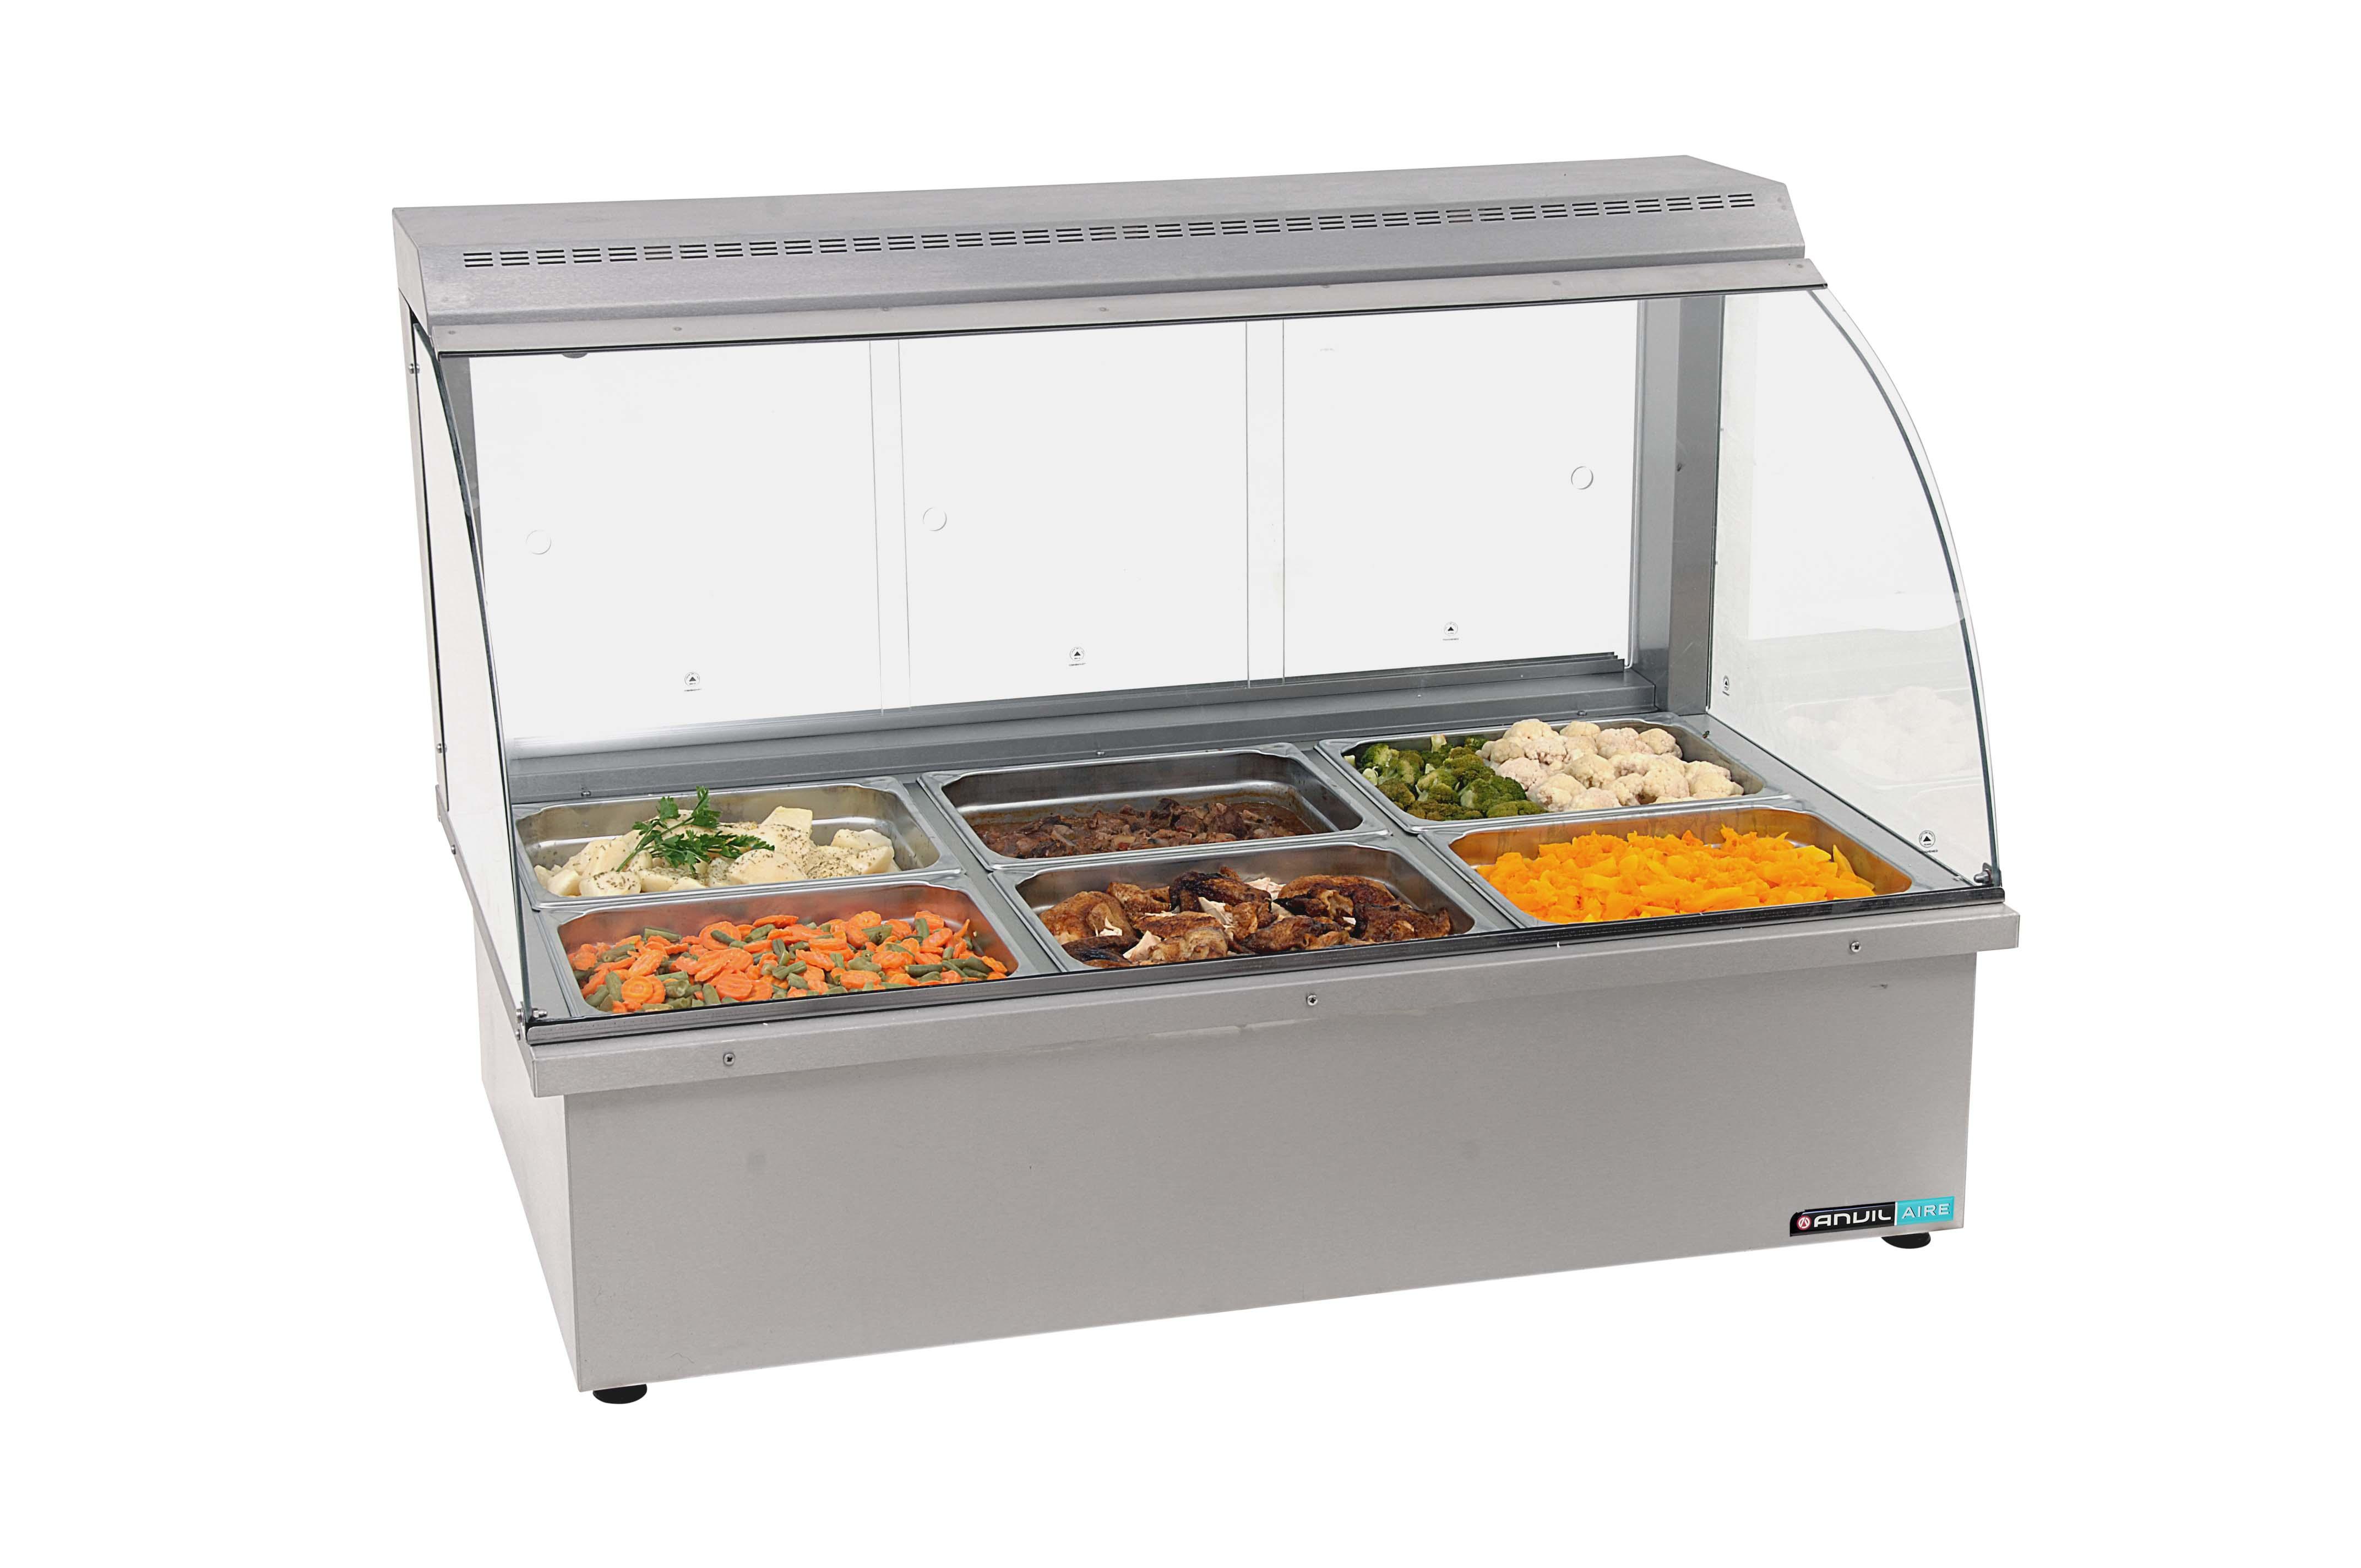 bma4003--hot-food-bar--bain-marie-anvil-table-top--3-division